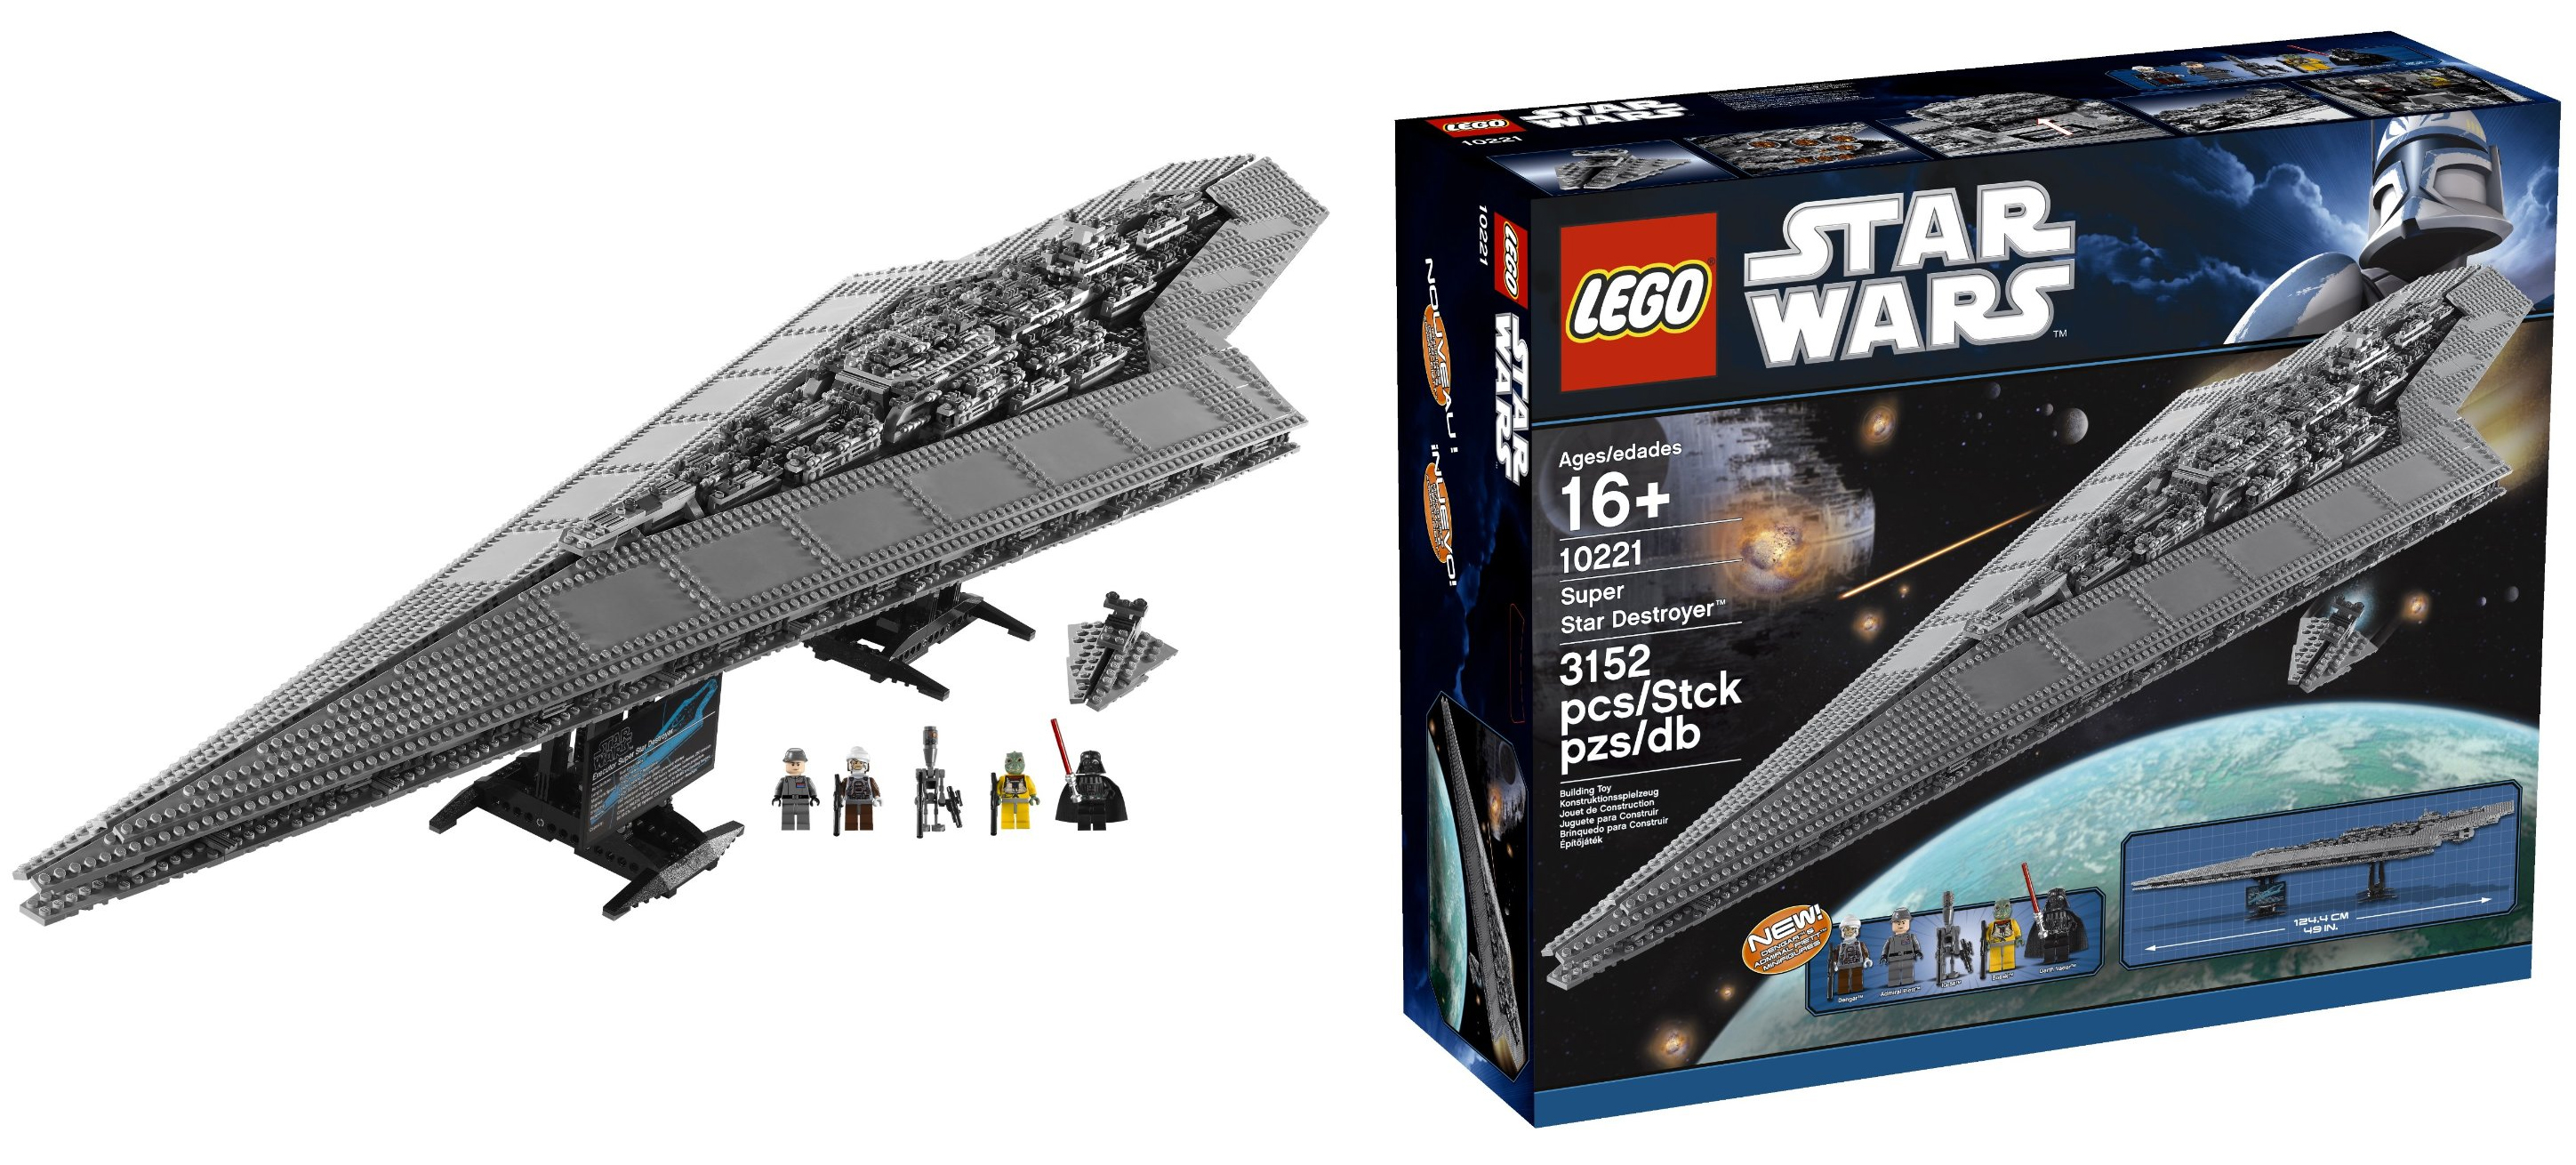 LEGO Star Wars set Super Star Destroyer 10221